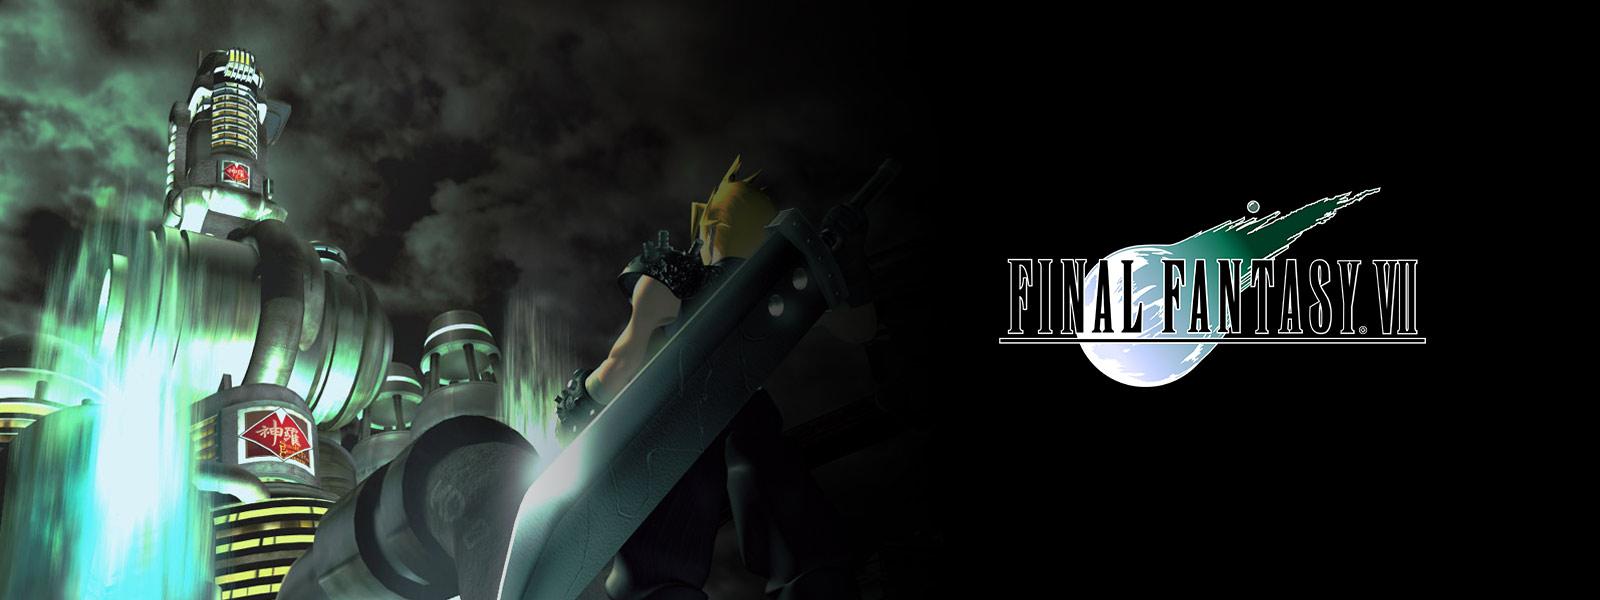 FINAL FANTASY VII-hovedpersonen Cloud Strife står med et gigantisk sverd på ryggen